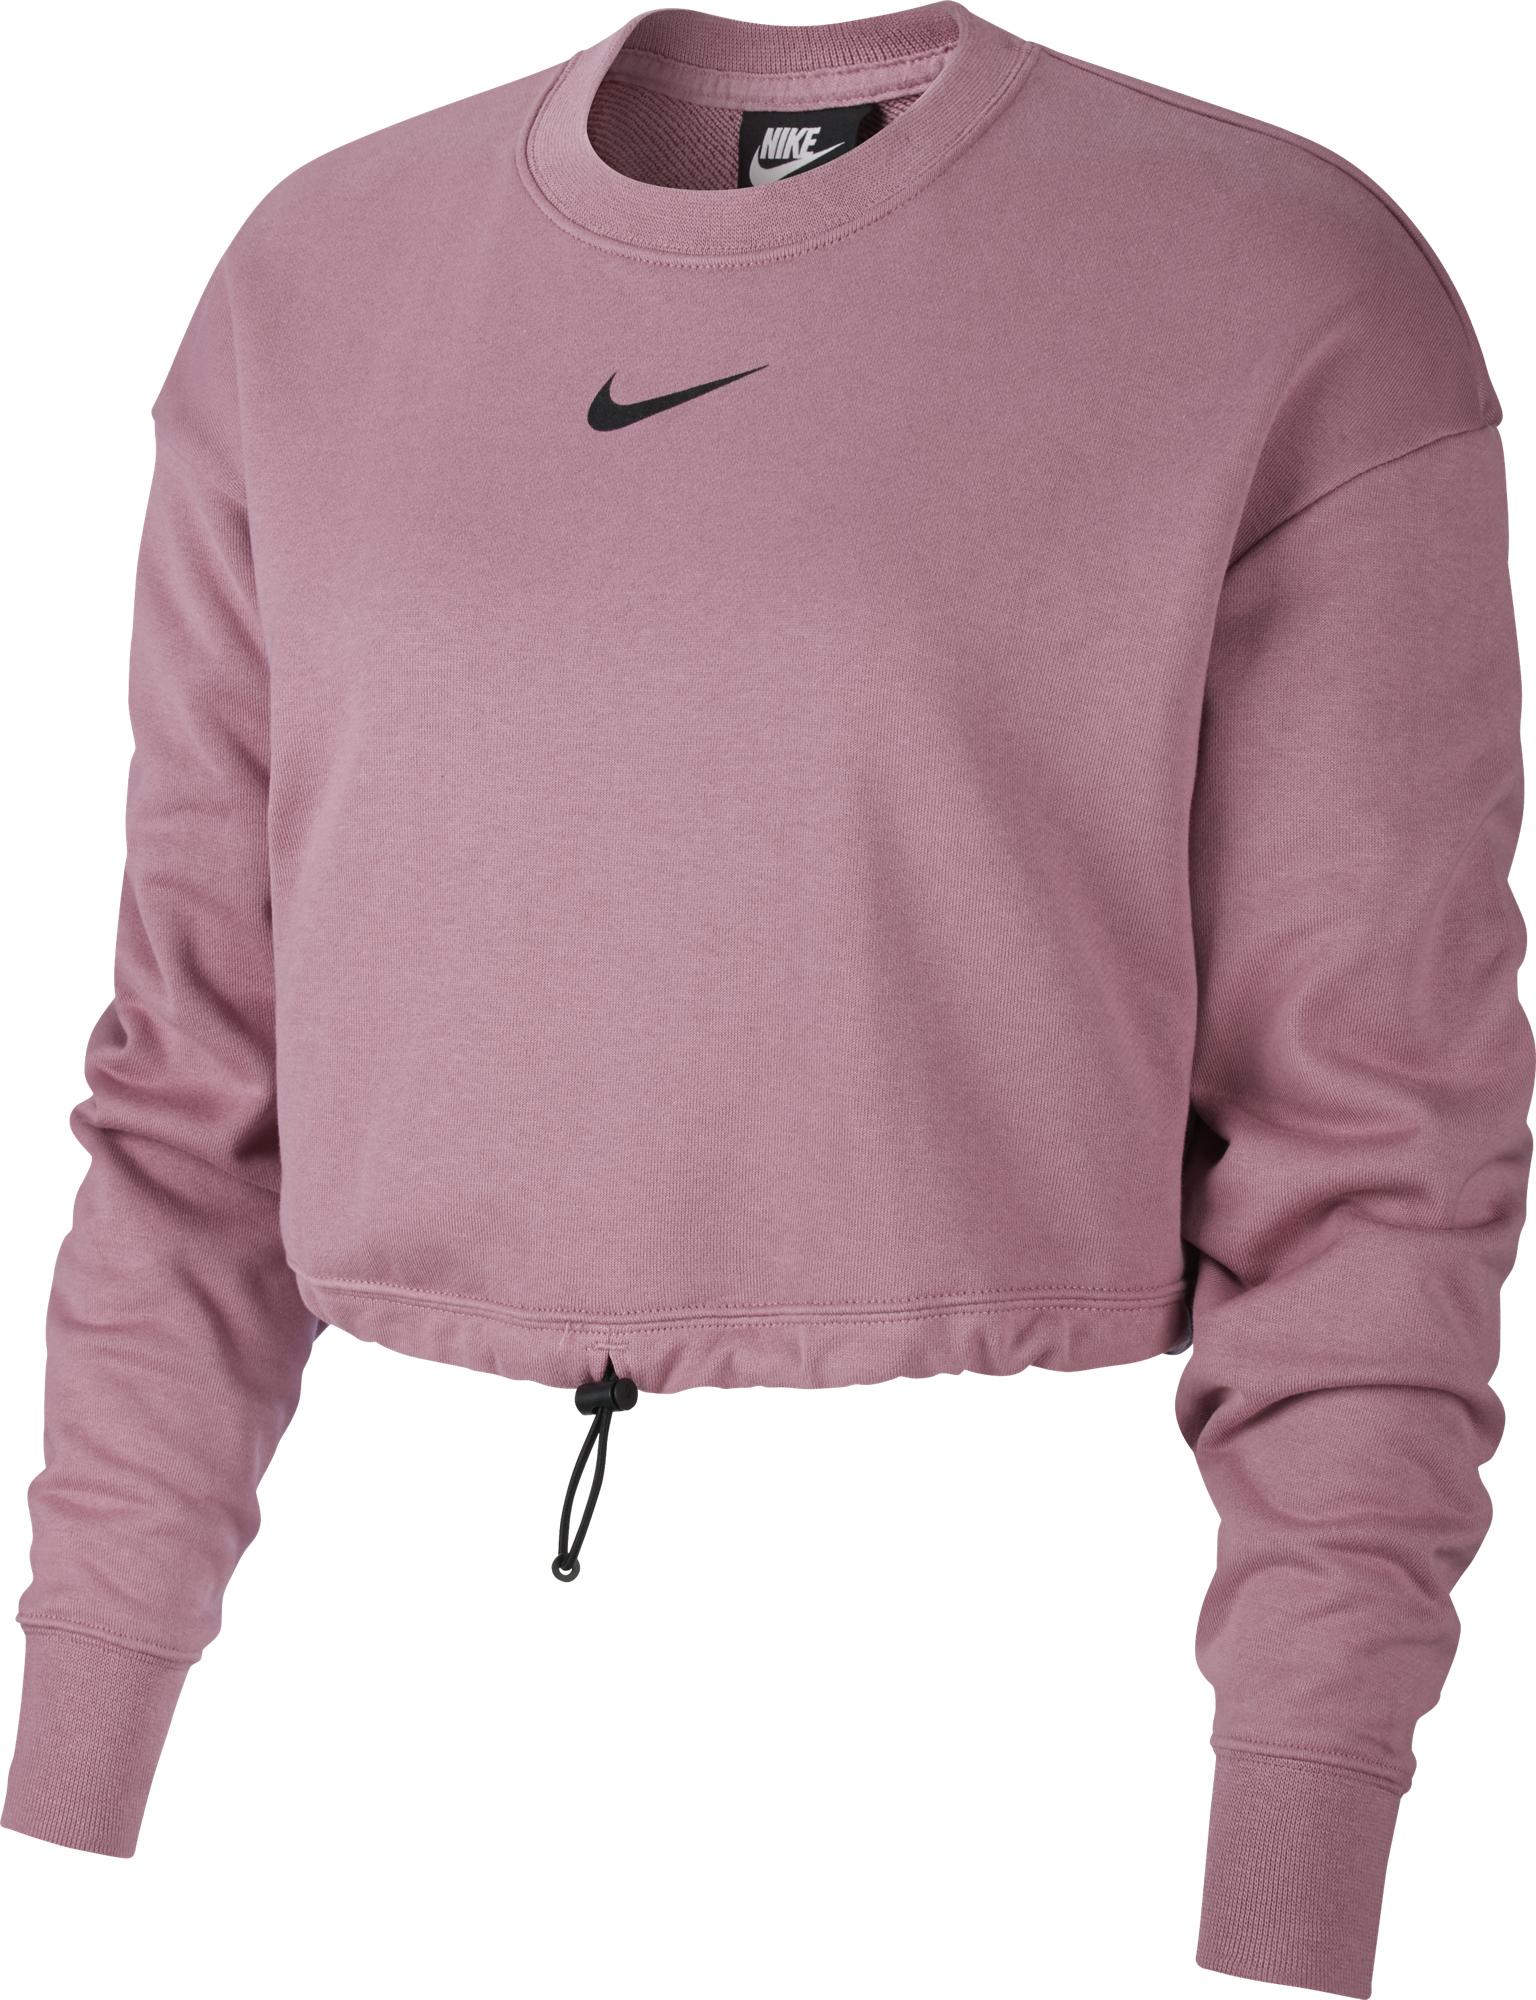 цена Nike Свитшот женский Nike Sportswear Swoosh, размер 42-44 онлайн в 2017 году